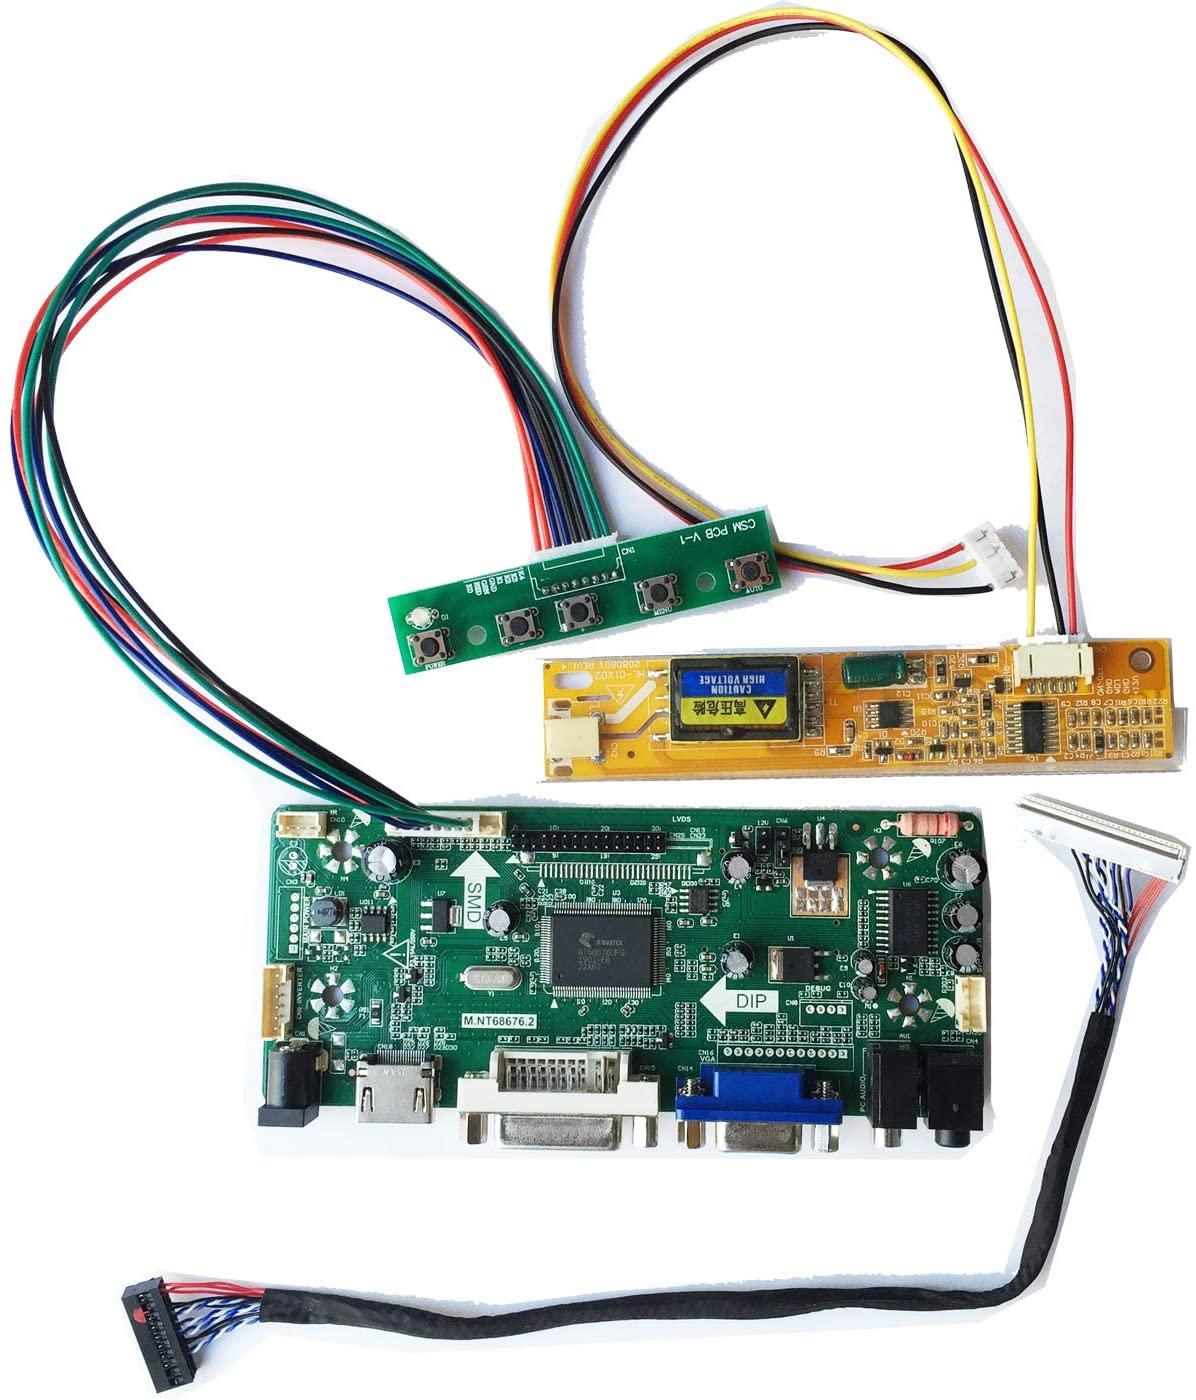 HDMI DVI VGA LCD Controller Board Monitor Kit for Turn LP141WX1(TL)(E1) 1280X800 into a Monitor